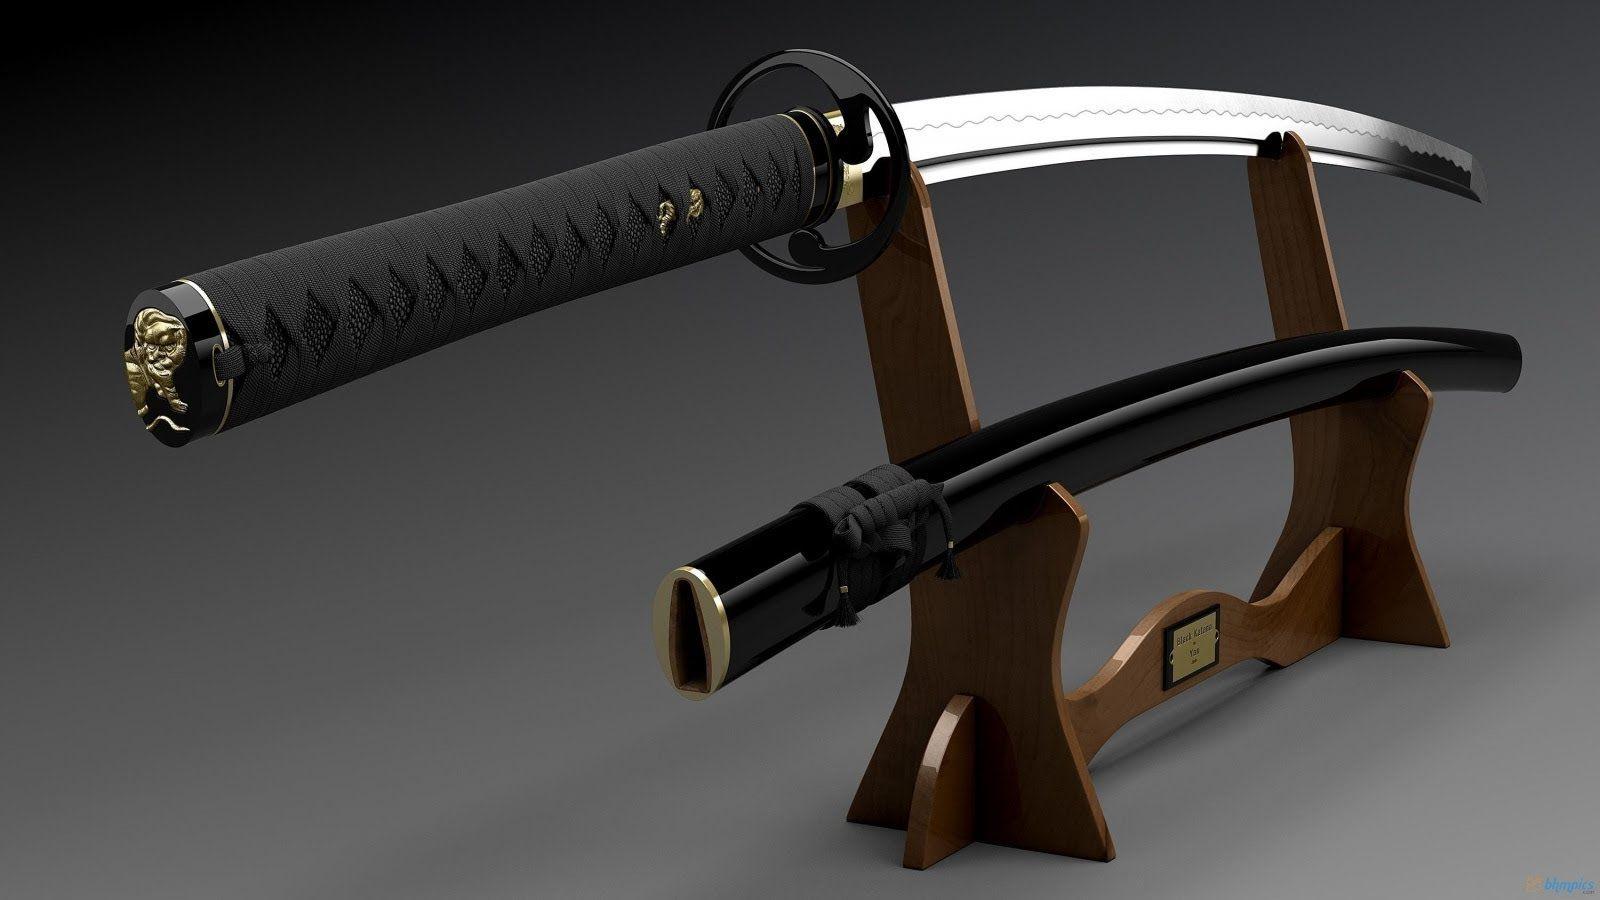 Katana Sword Wallpaper 1600x900 10694 Espadas Katana